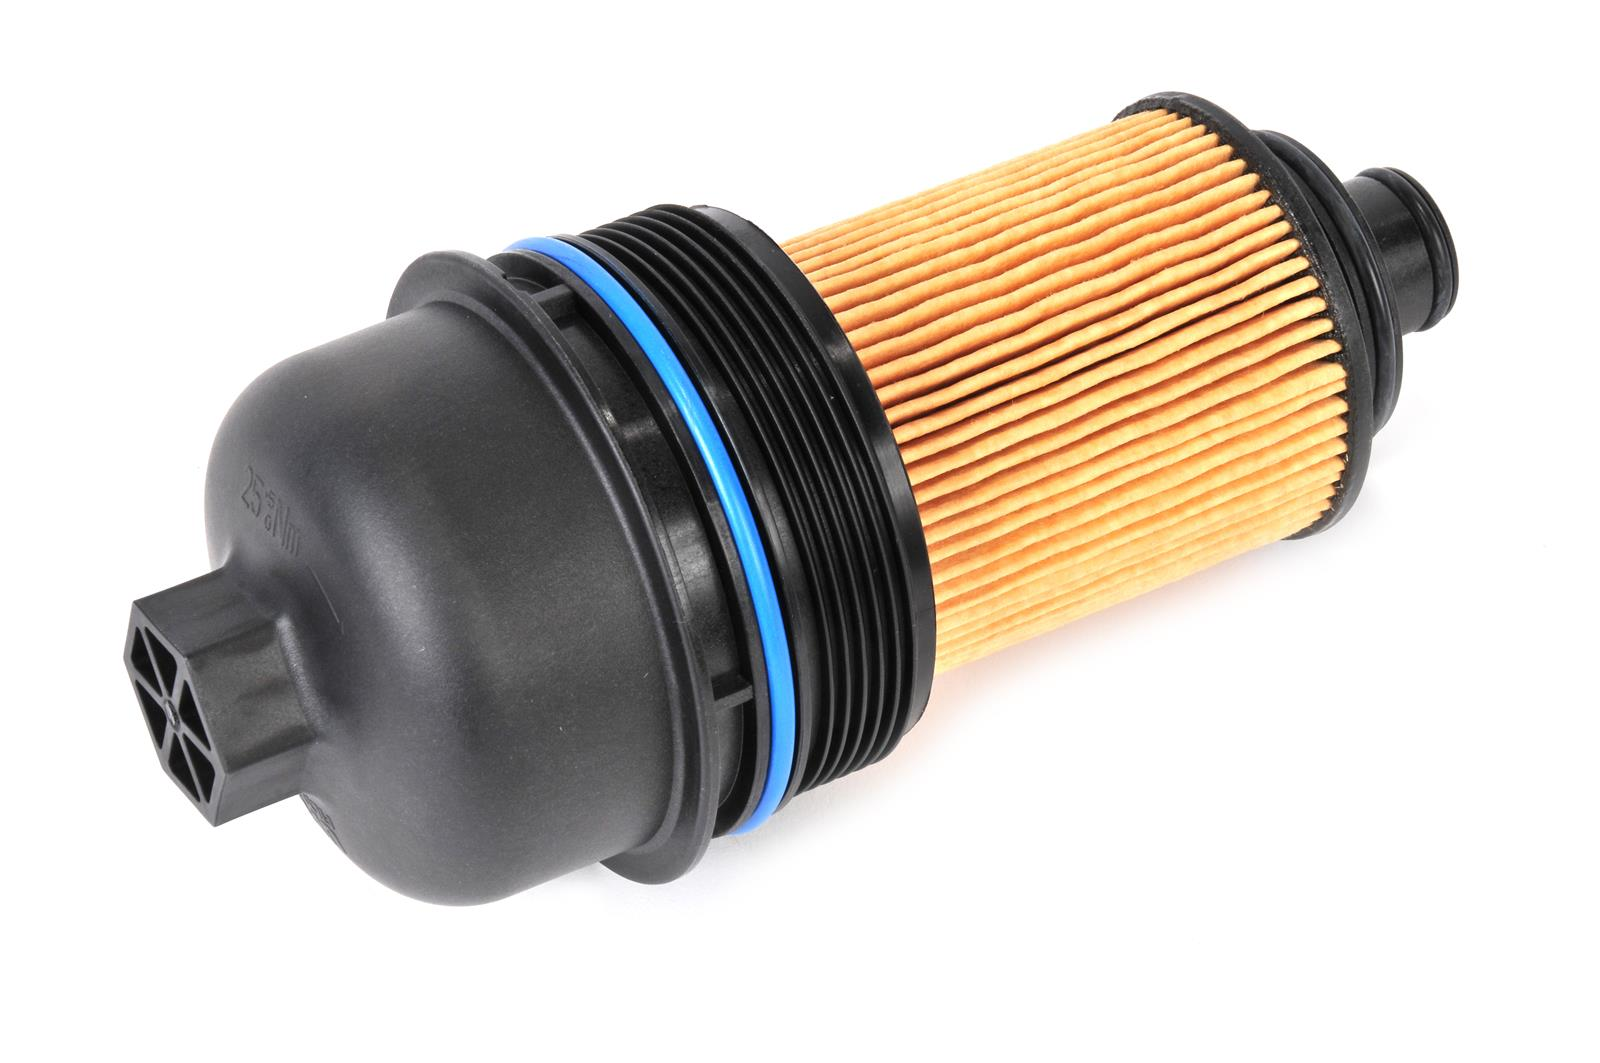 Suspension ado suspension ado with suspension ado lampe for Kit suspension luminaire